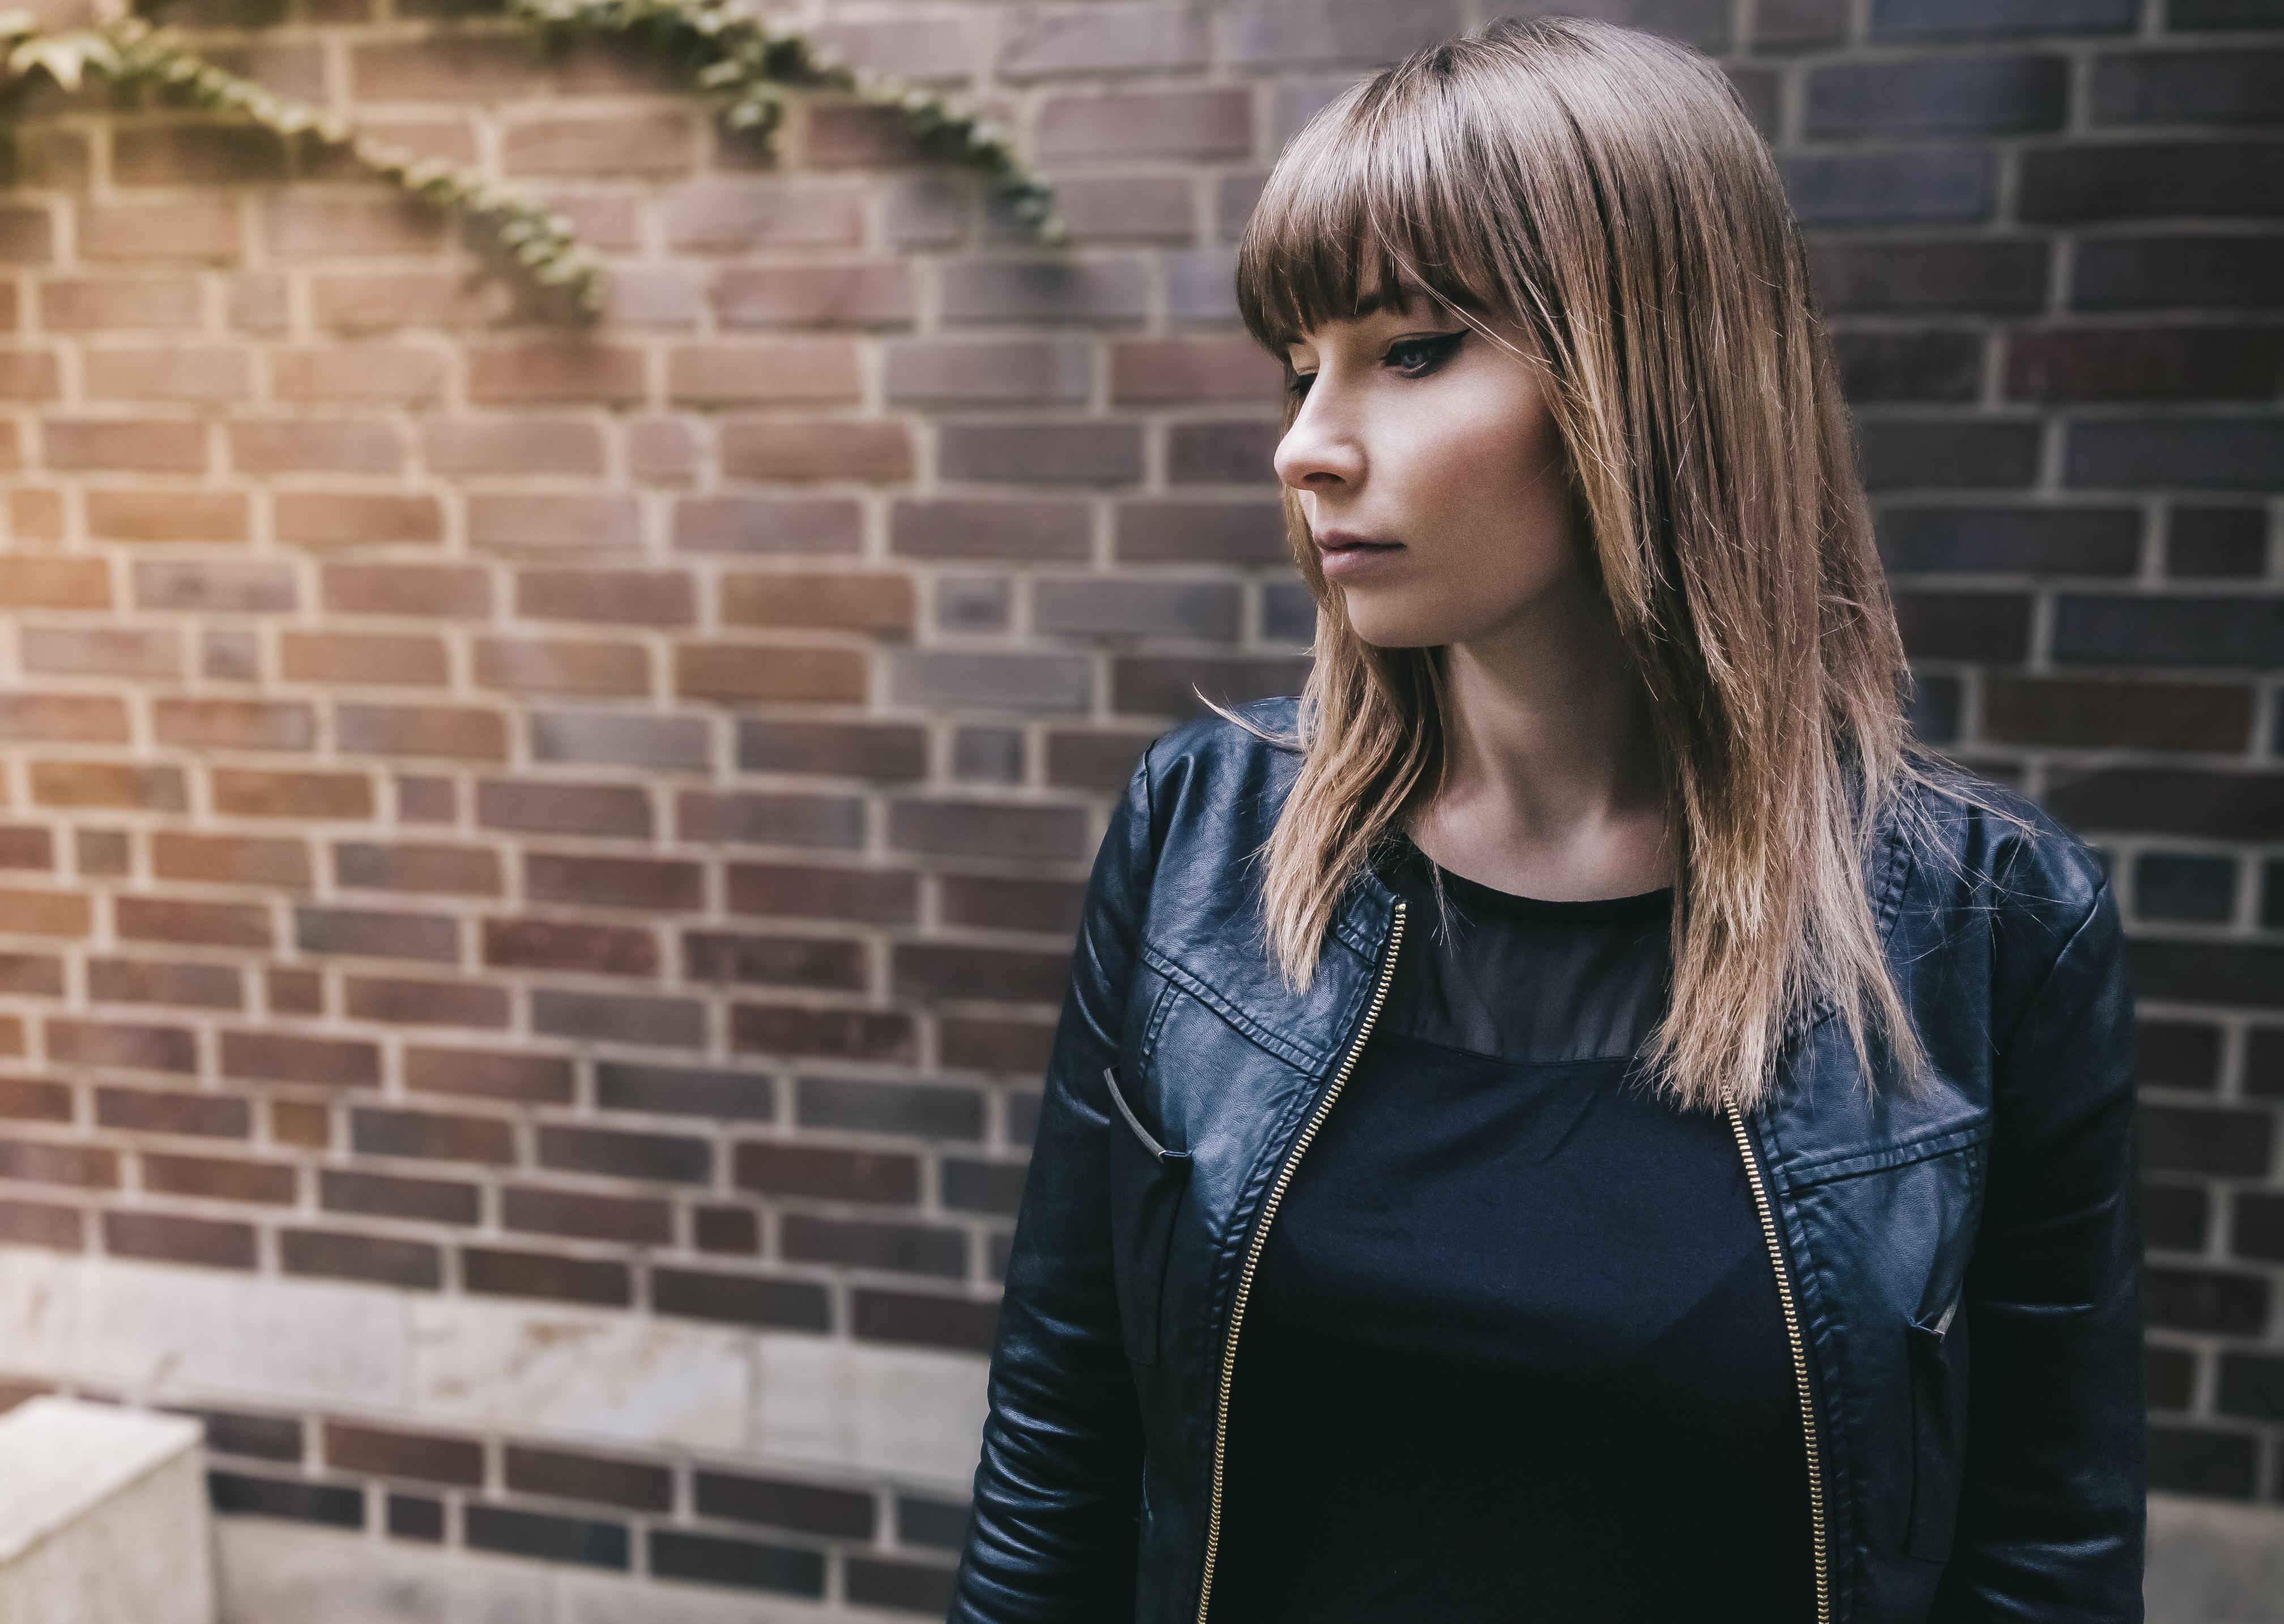 woman wearing black jacket standing beside concrete brick wall